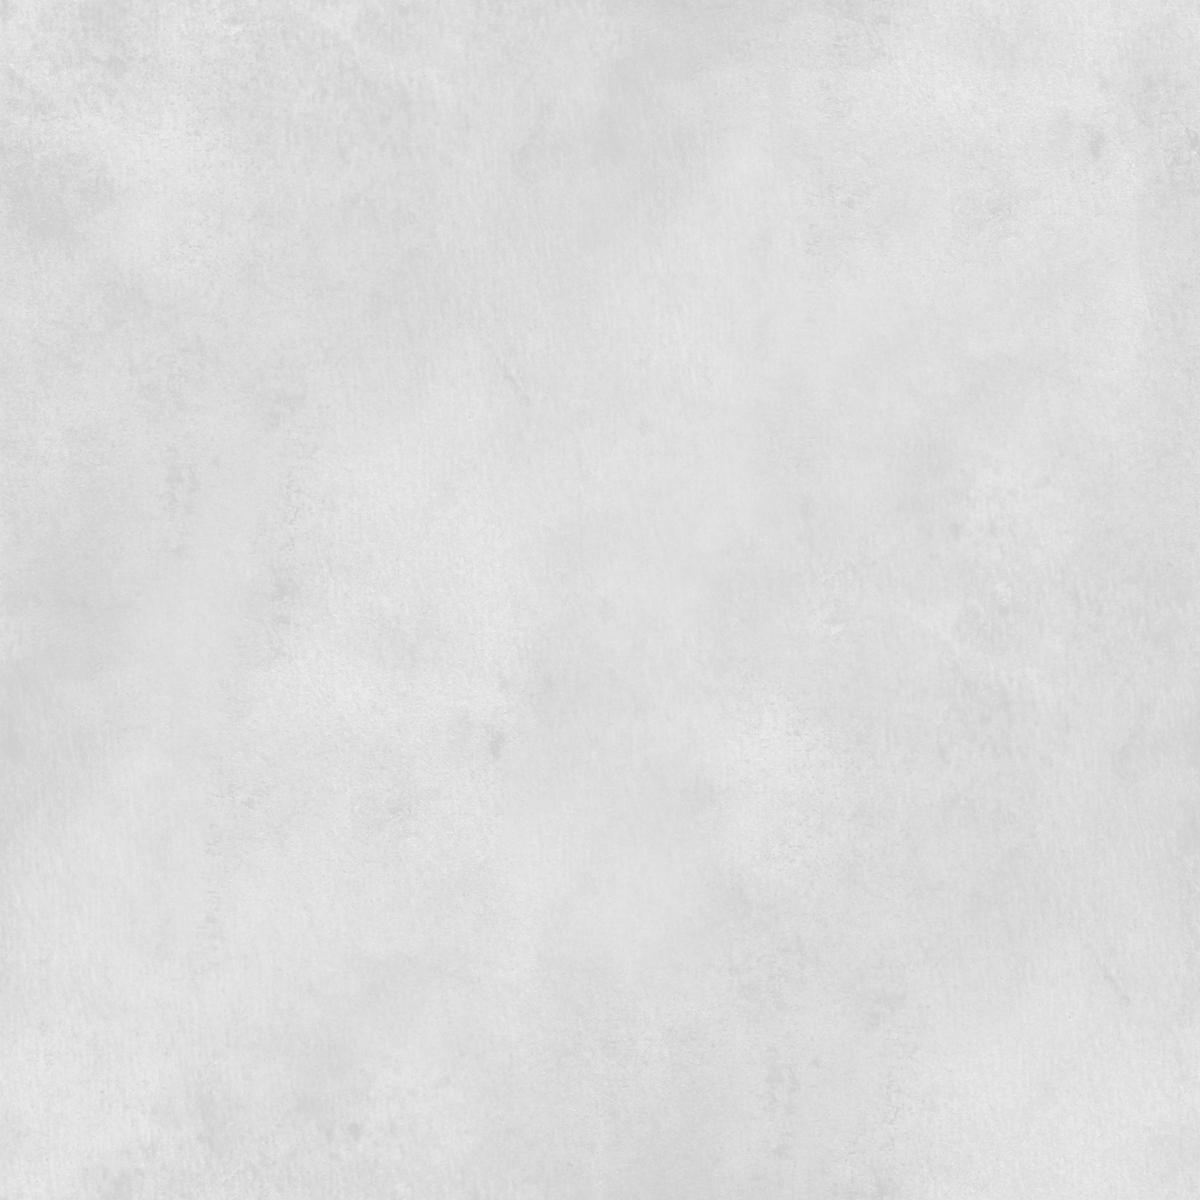 background light gray textured wisconline oer